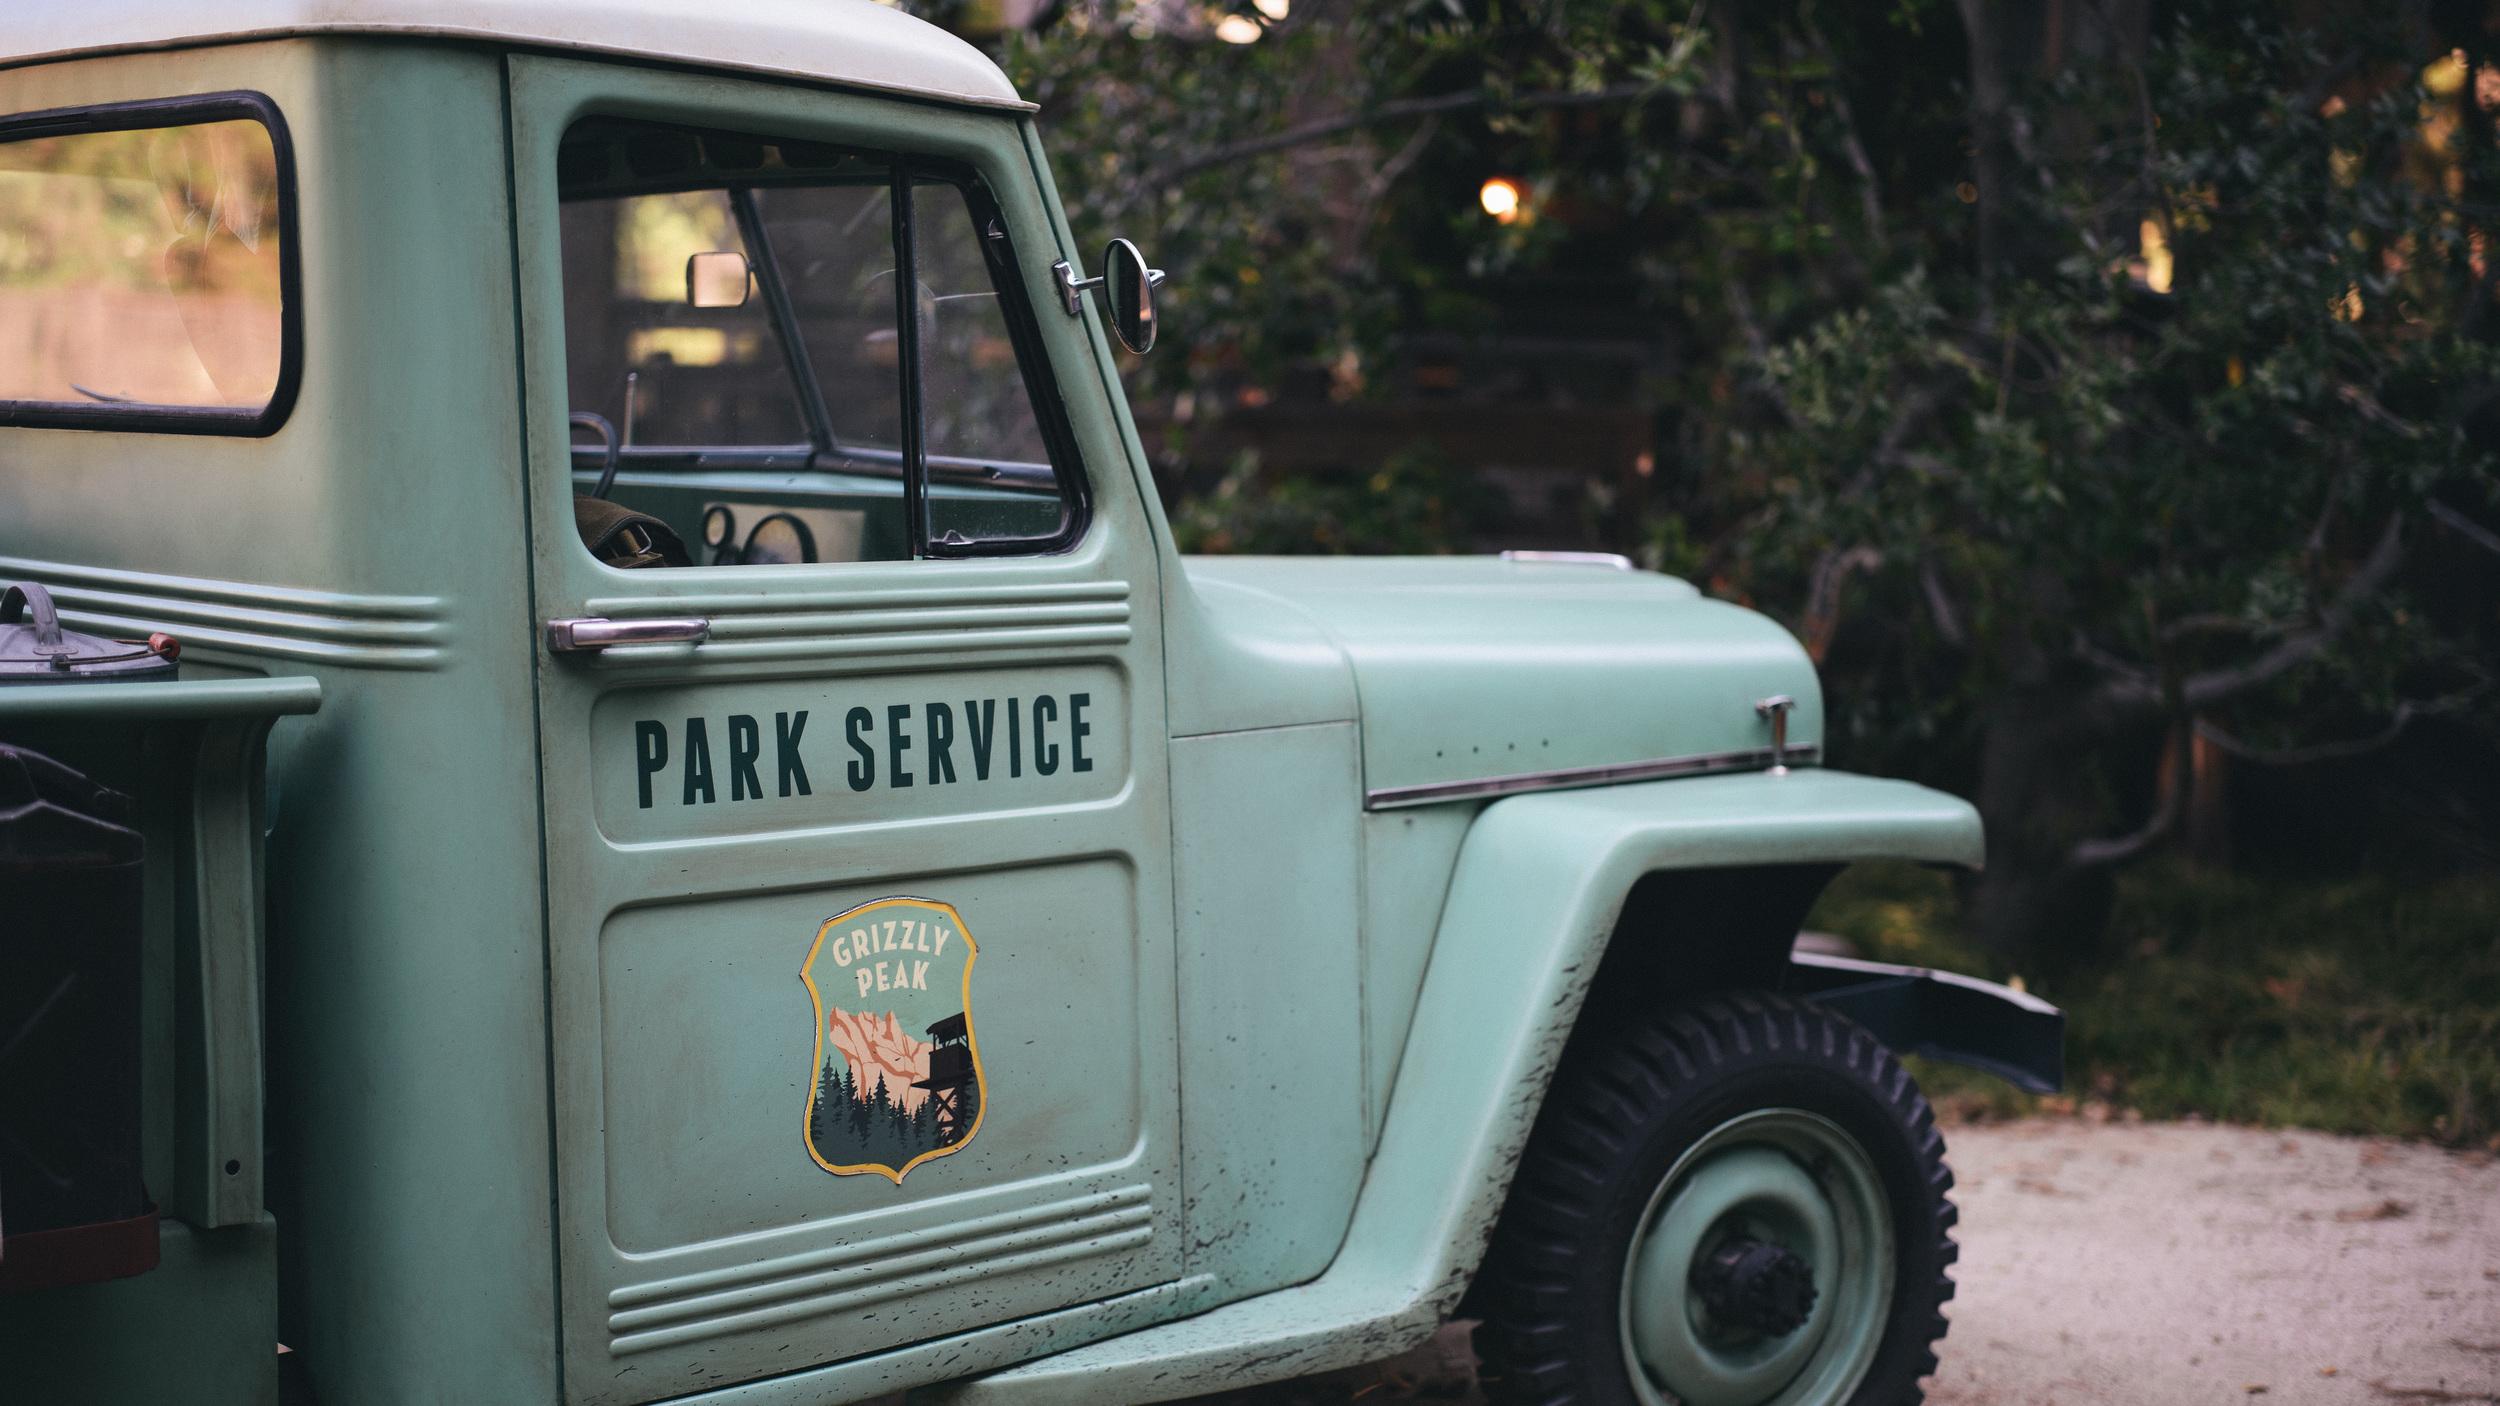 Grizzly Peak Park Service